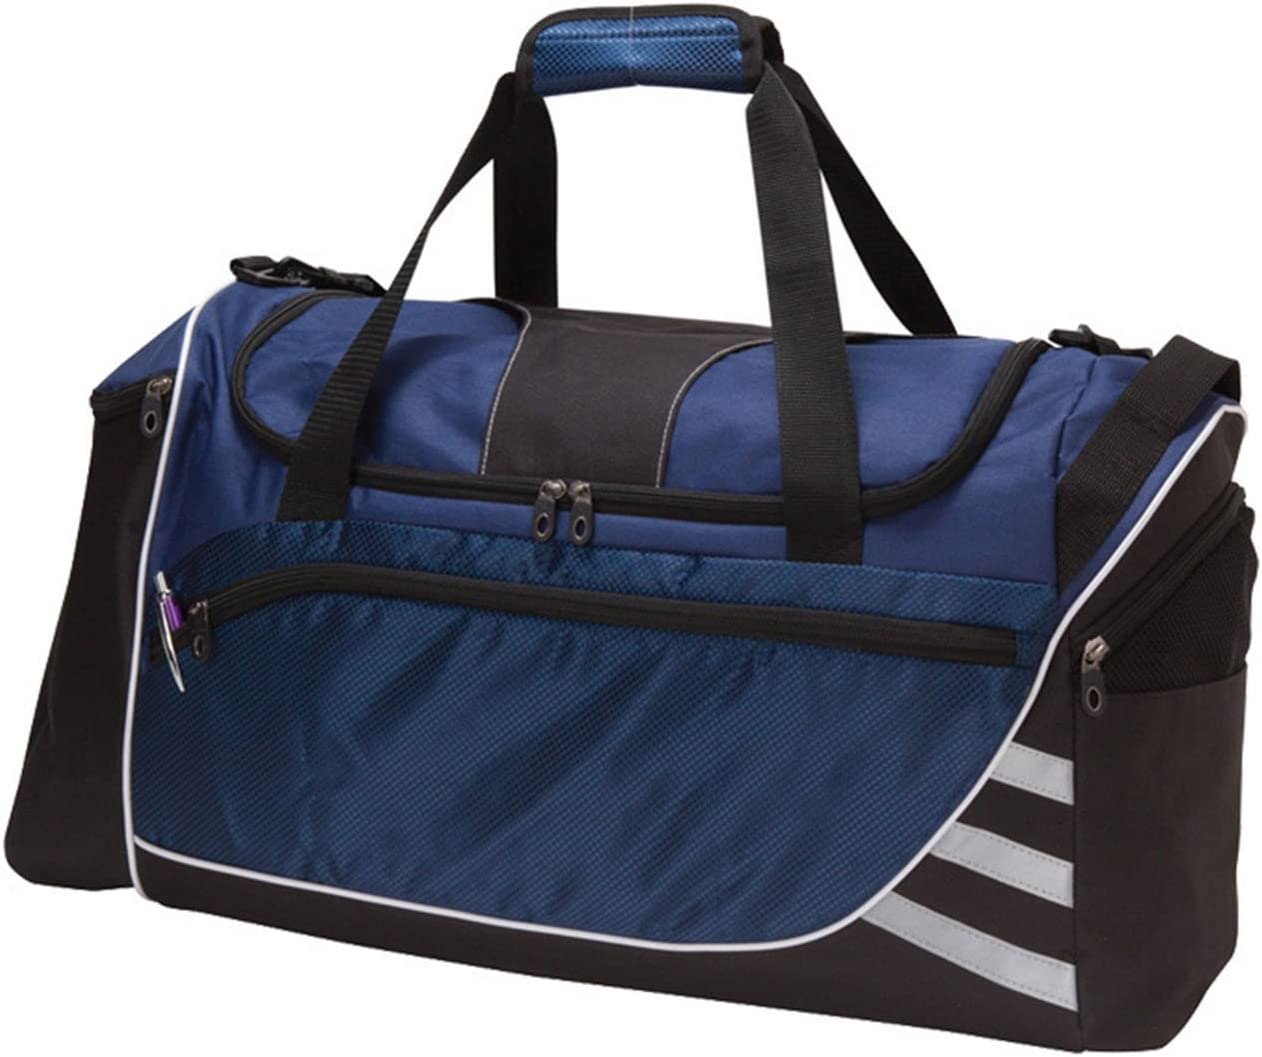 Signature Pattern 24inch Nylon Polyester Blue Lightweight Crossfit Gym Bag